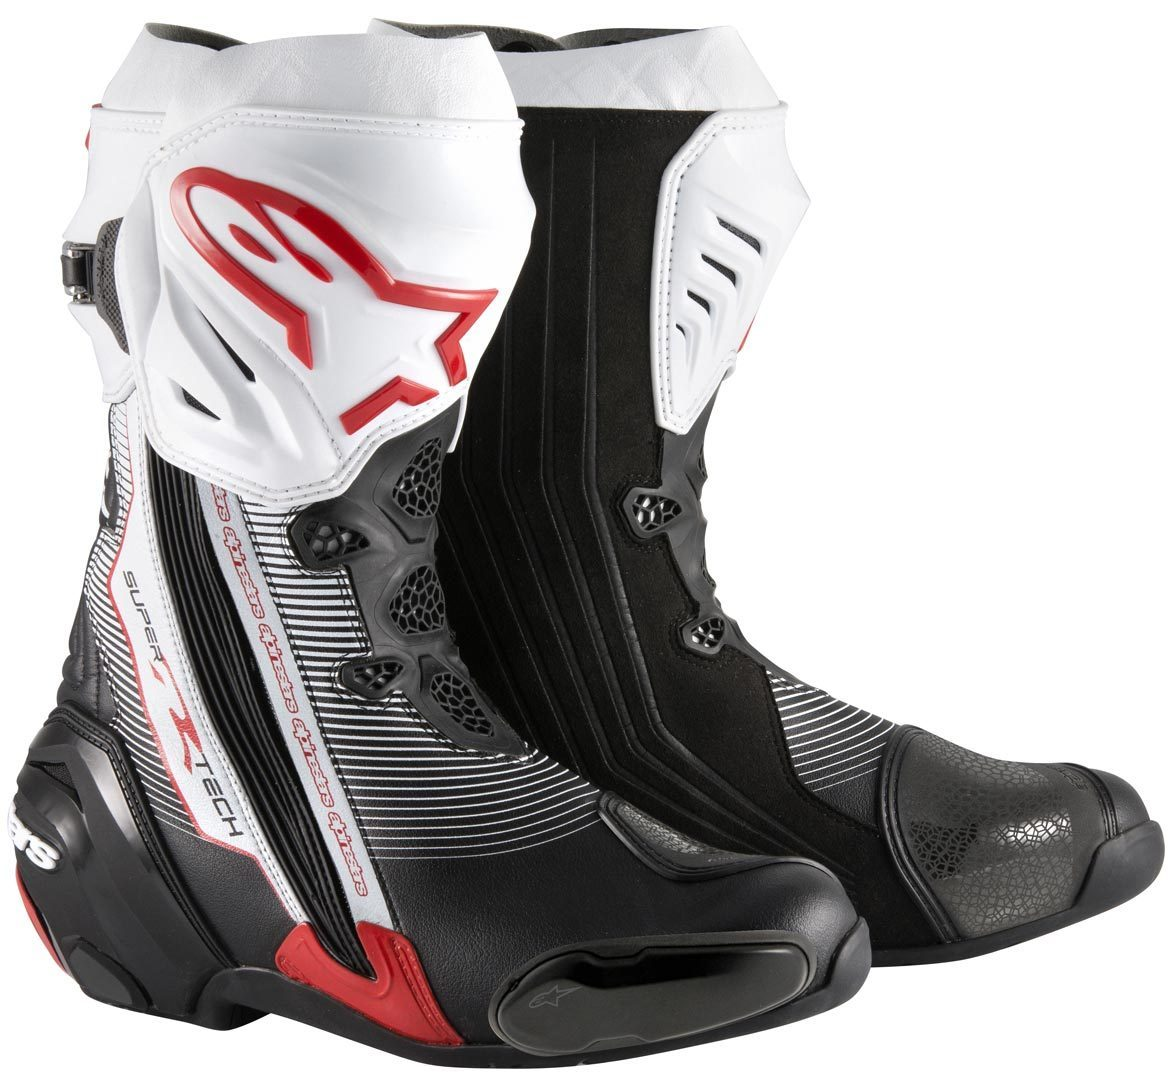 Bota Alpinestars Supertech R - (Black/Red/White)  - Nova Suzuki Motos e Acessórios